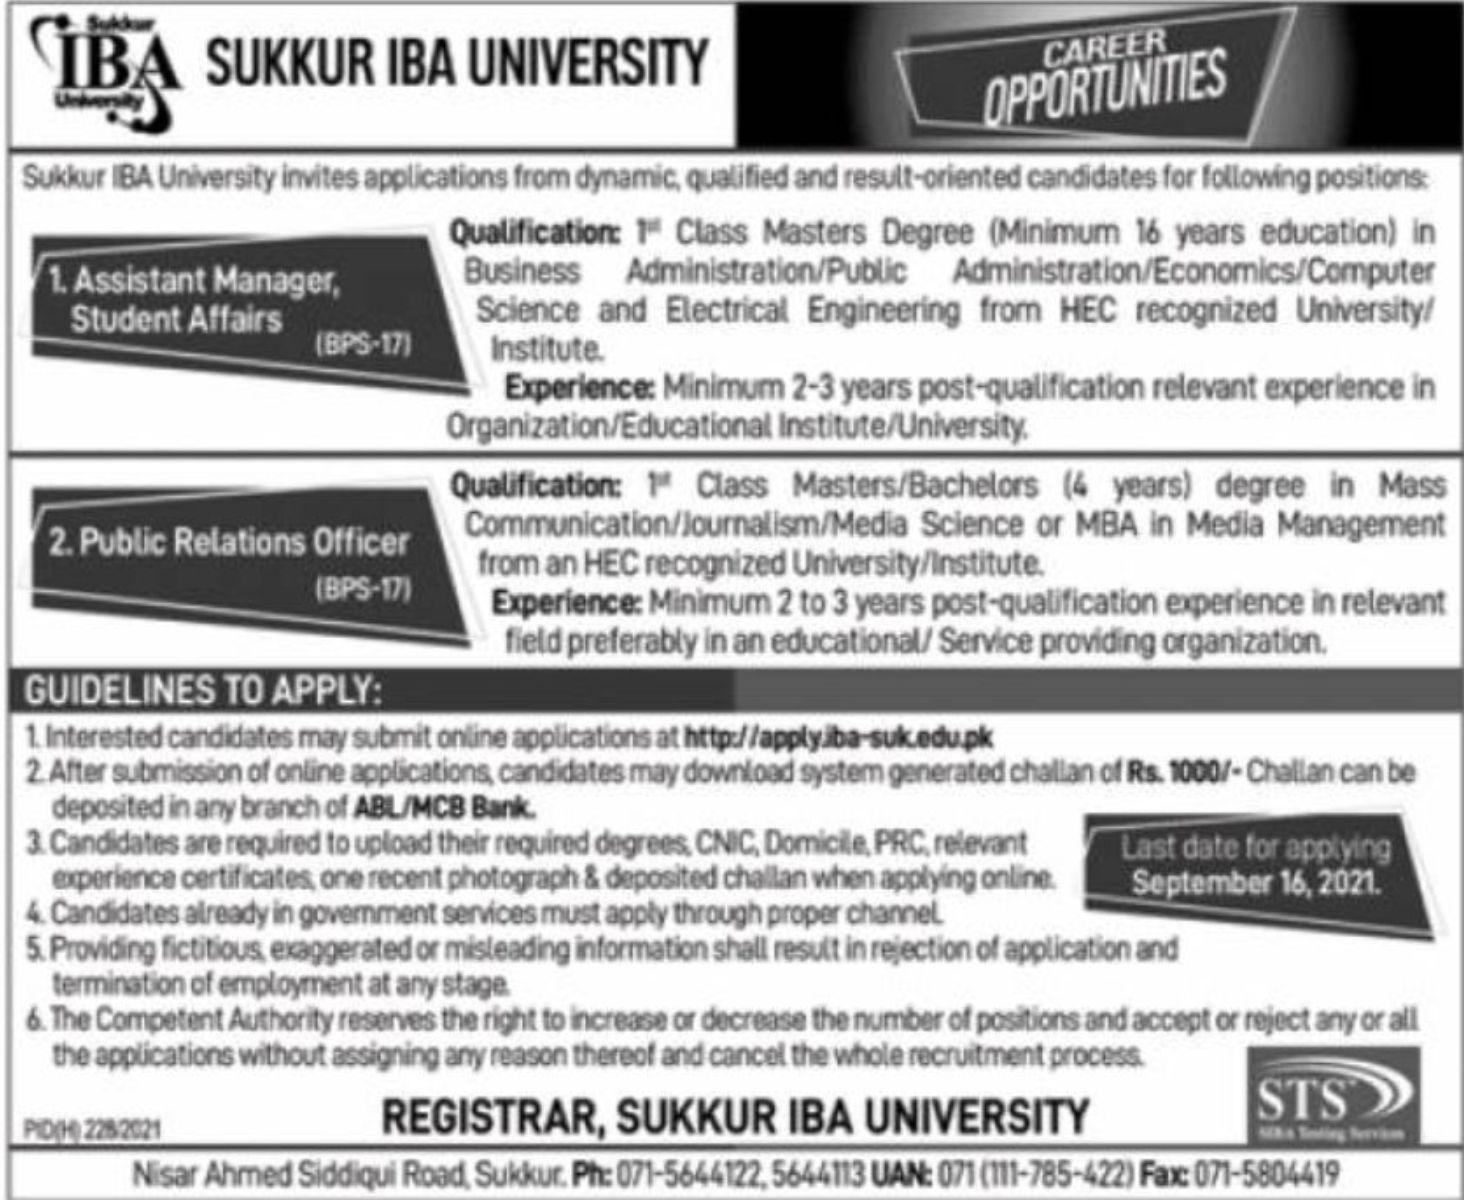 Sukkur IBA University Vacancies 2021 3